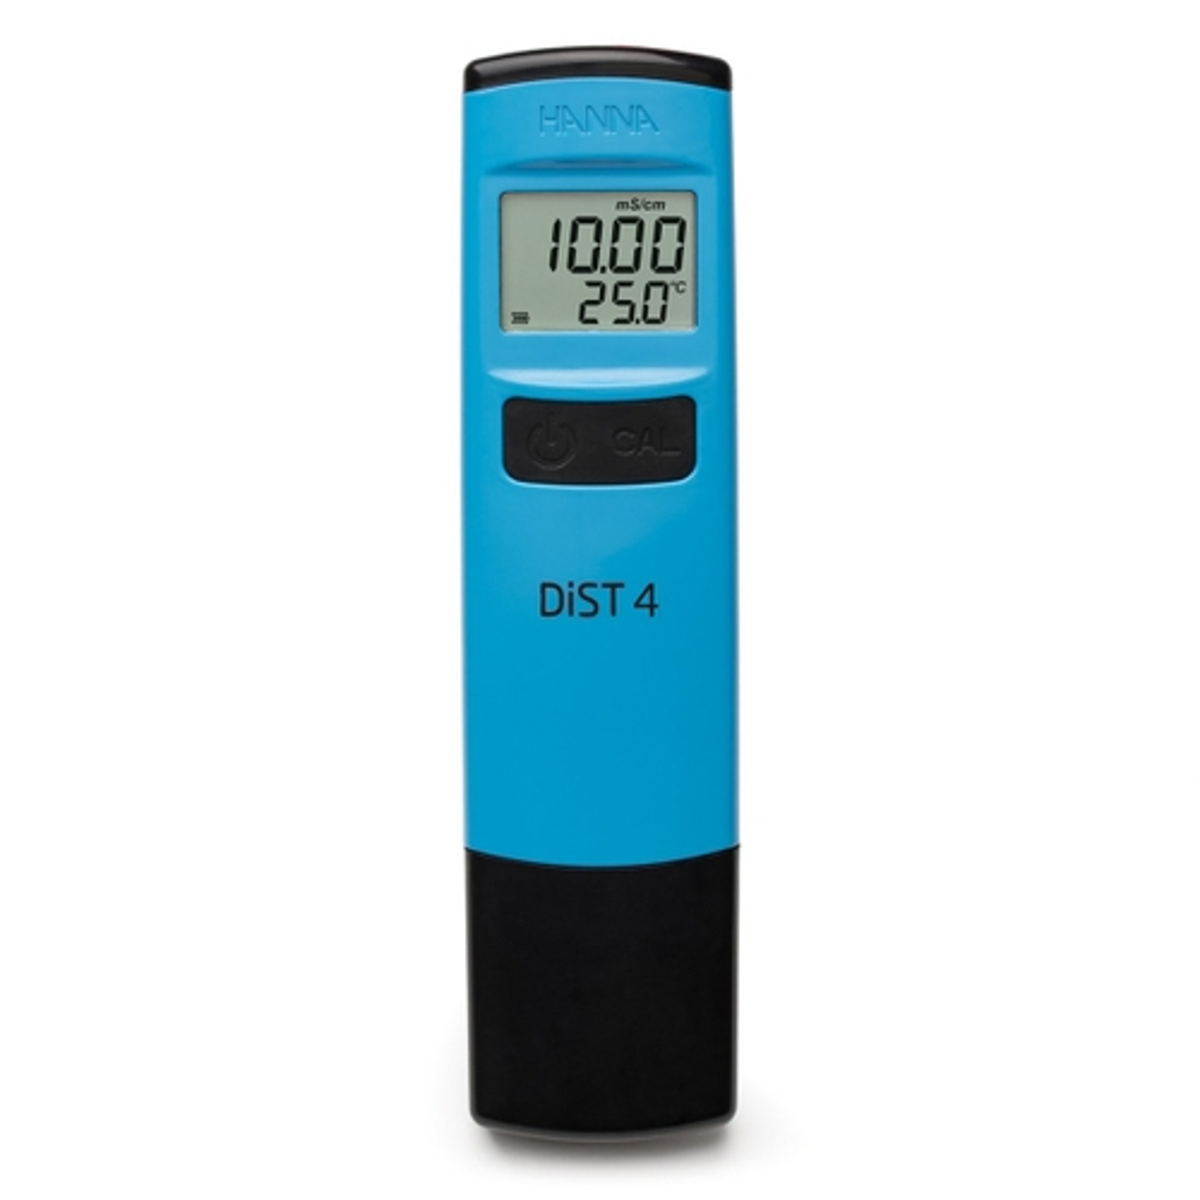 HI98304 Dist 4 High Range EC Tester